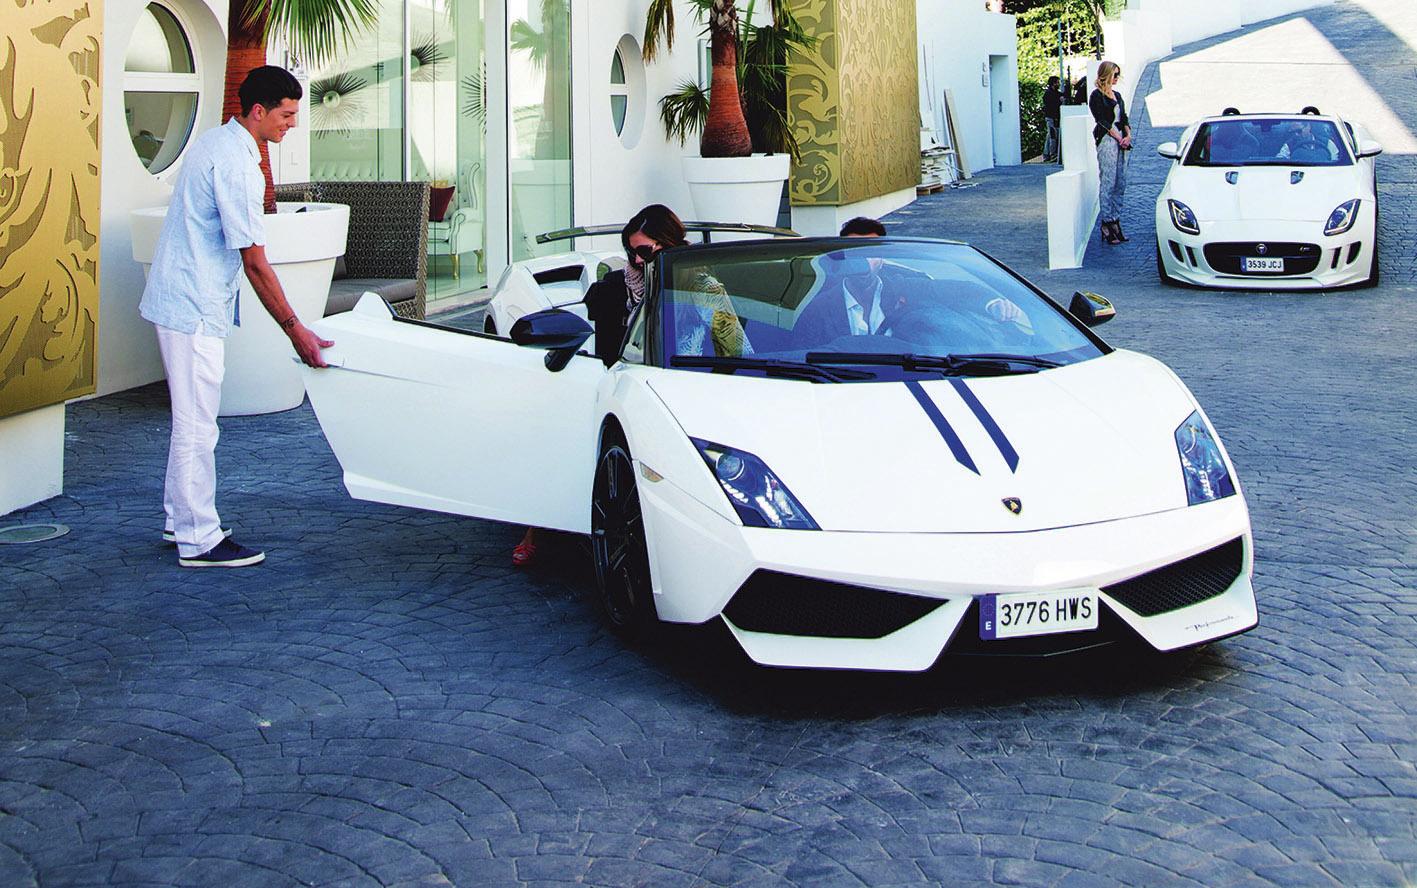 Das ultimative Luxuswochenende auf Mallorca – Lamborghini, Fendi und ein rasantes neues Luxushotel